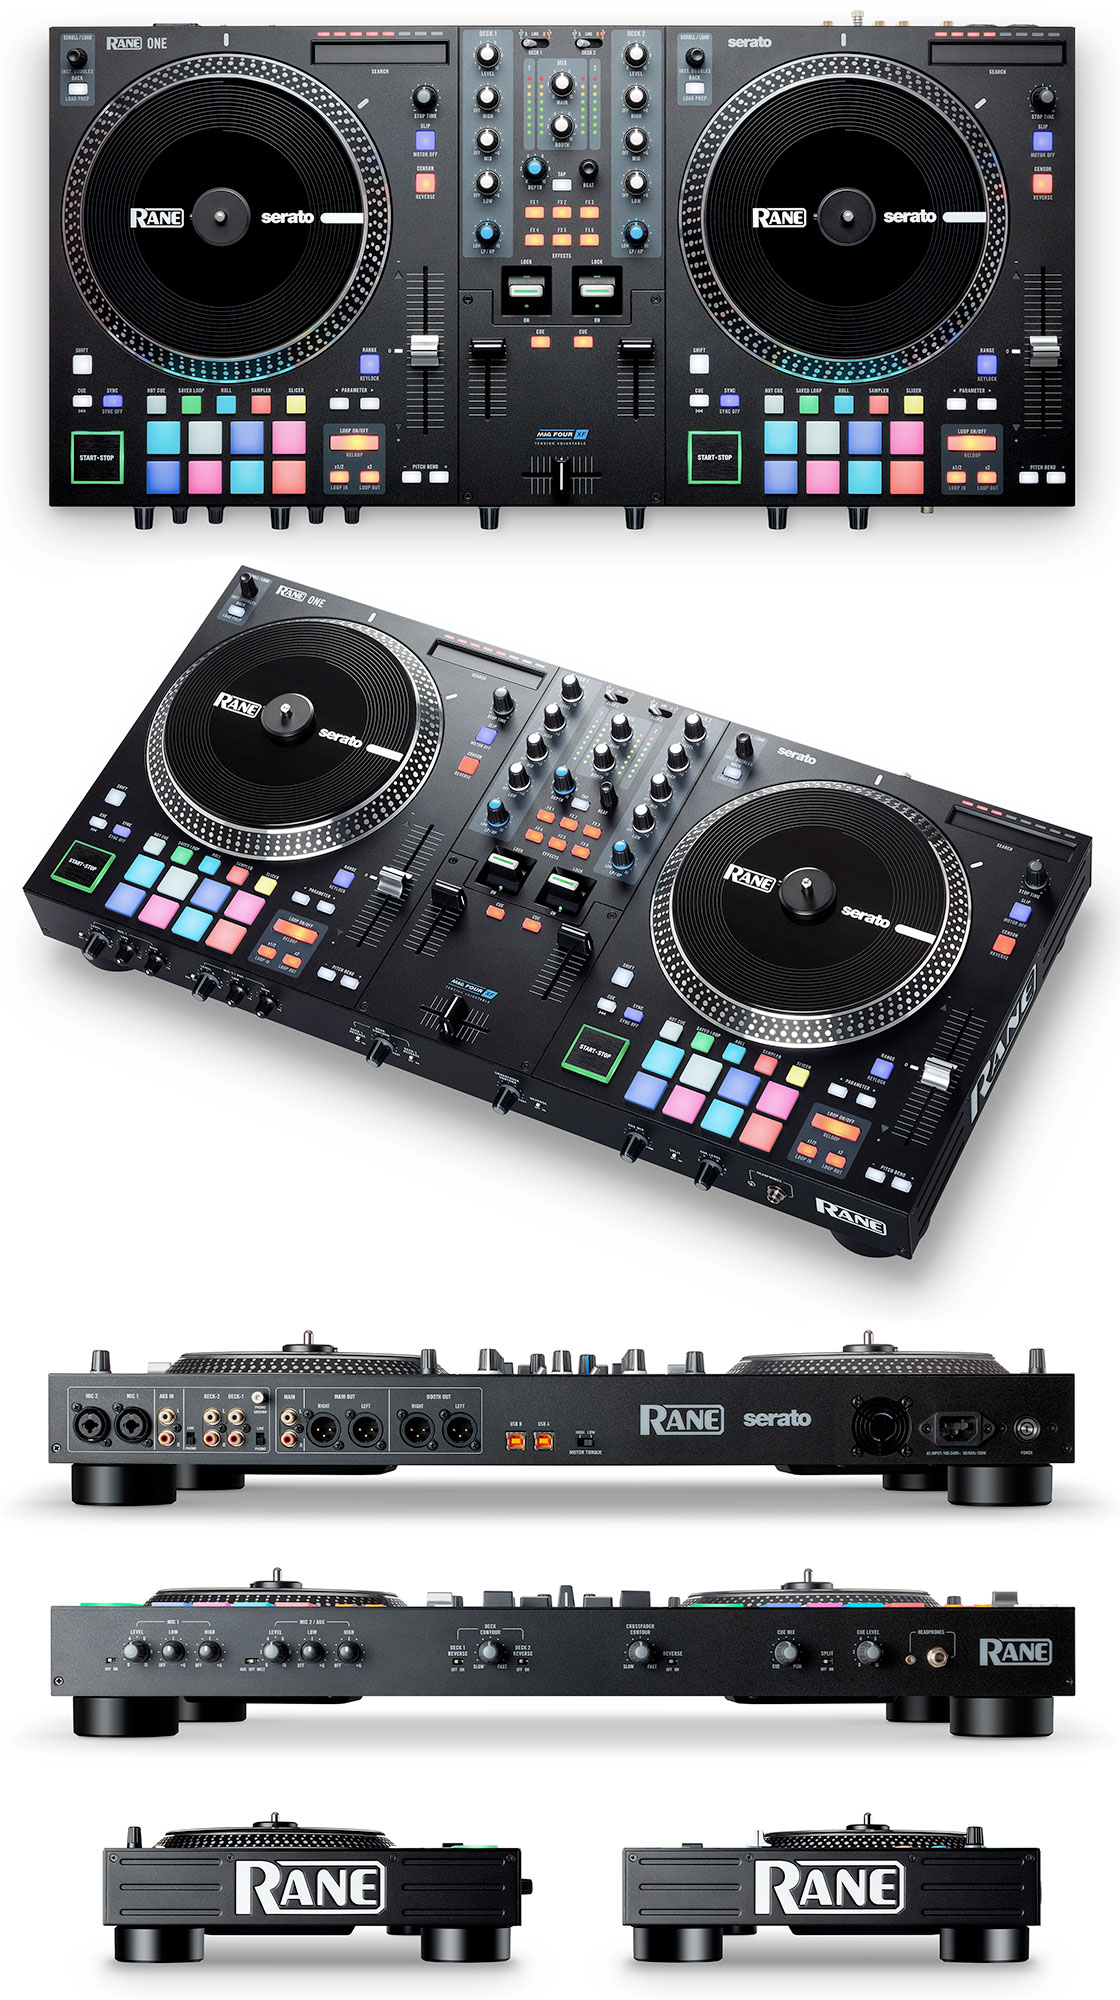 Rane ONE Motorized DJ Controller